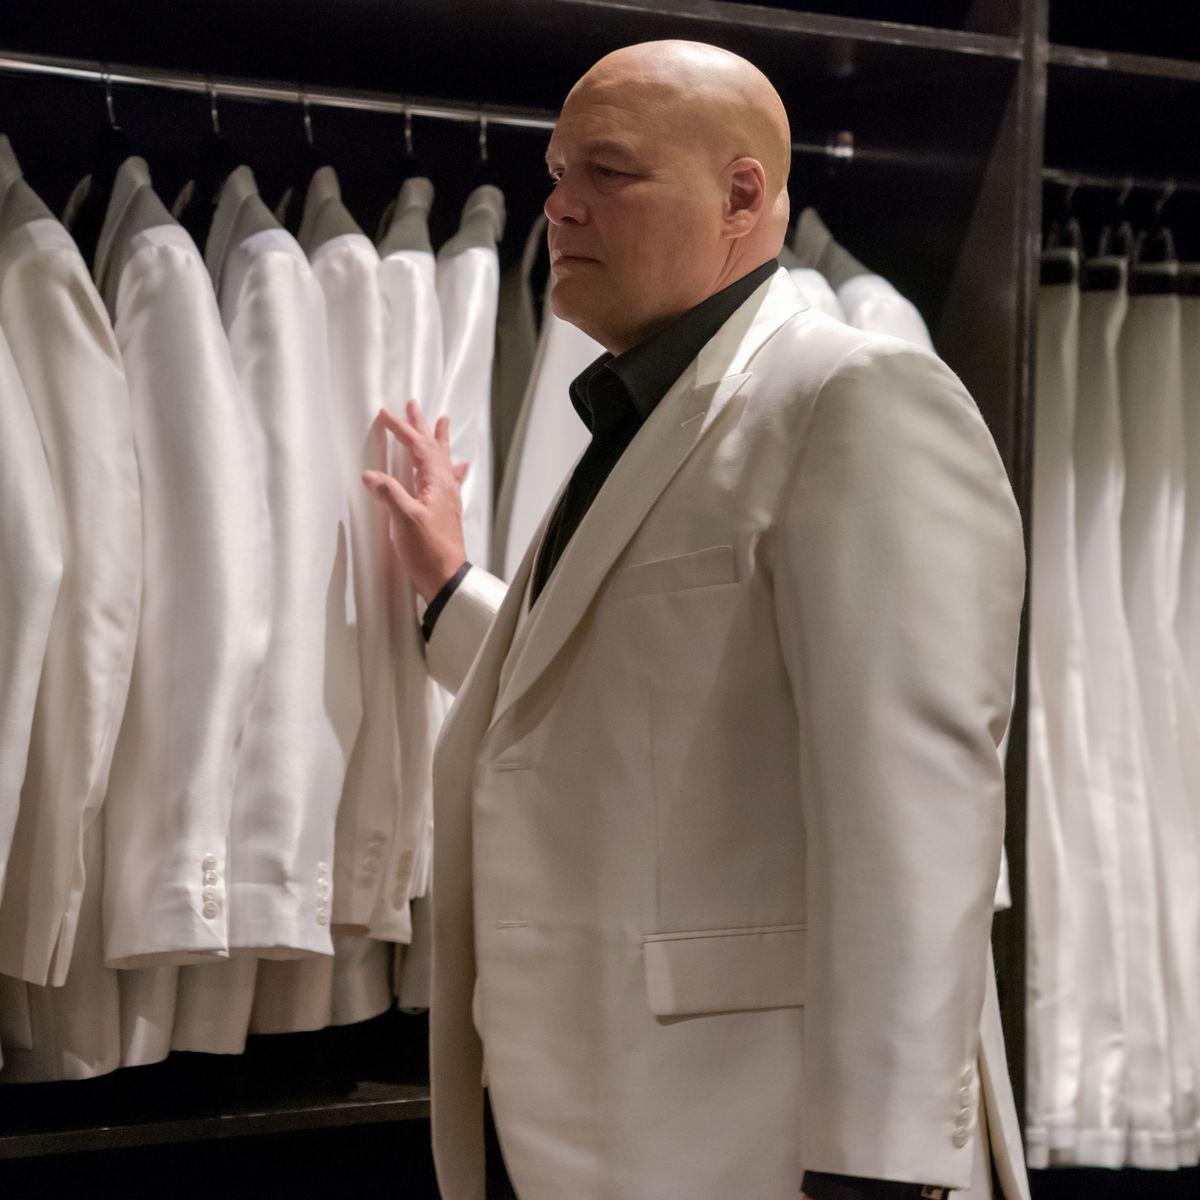 Wilson Fisk White Suit Daredevil Season 3 Netflix